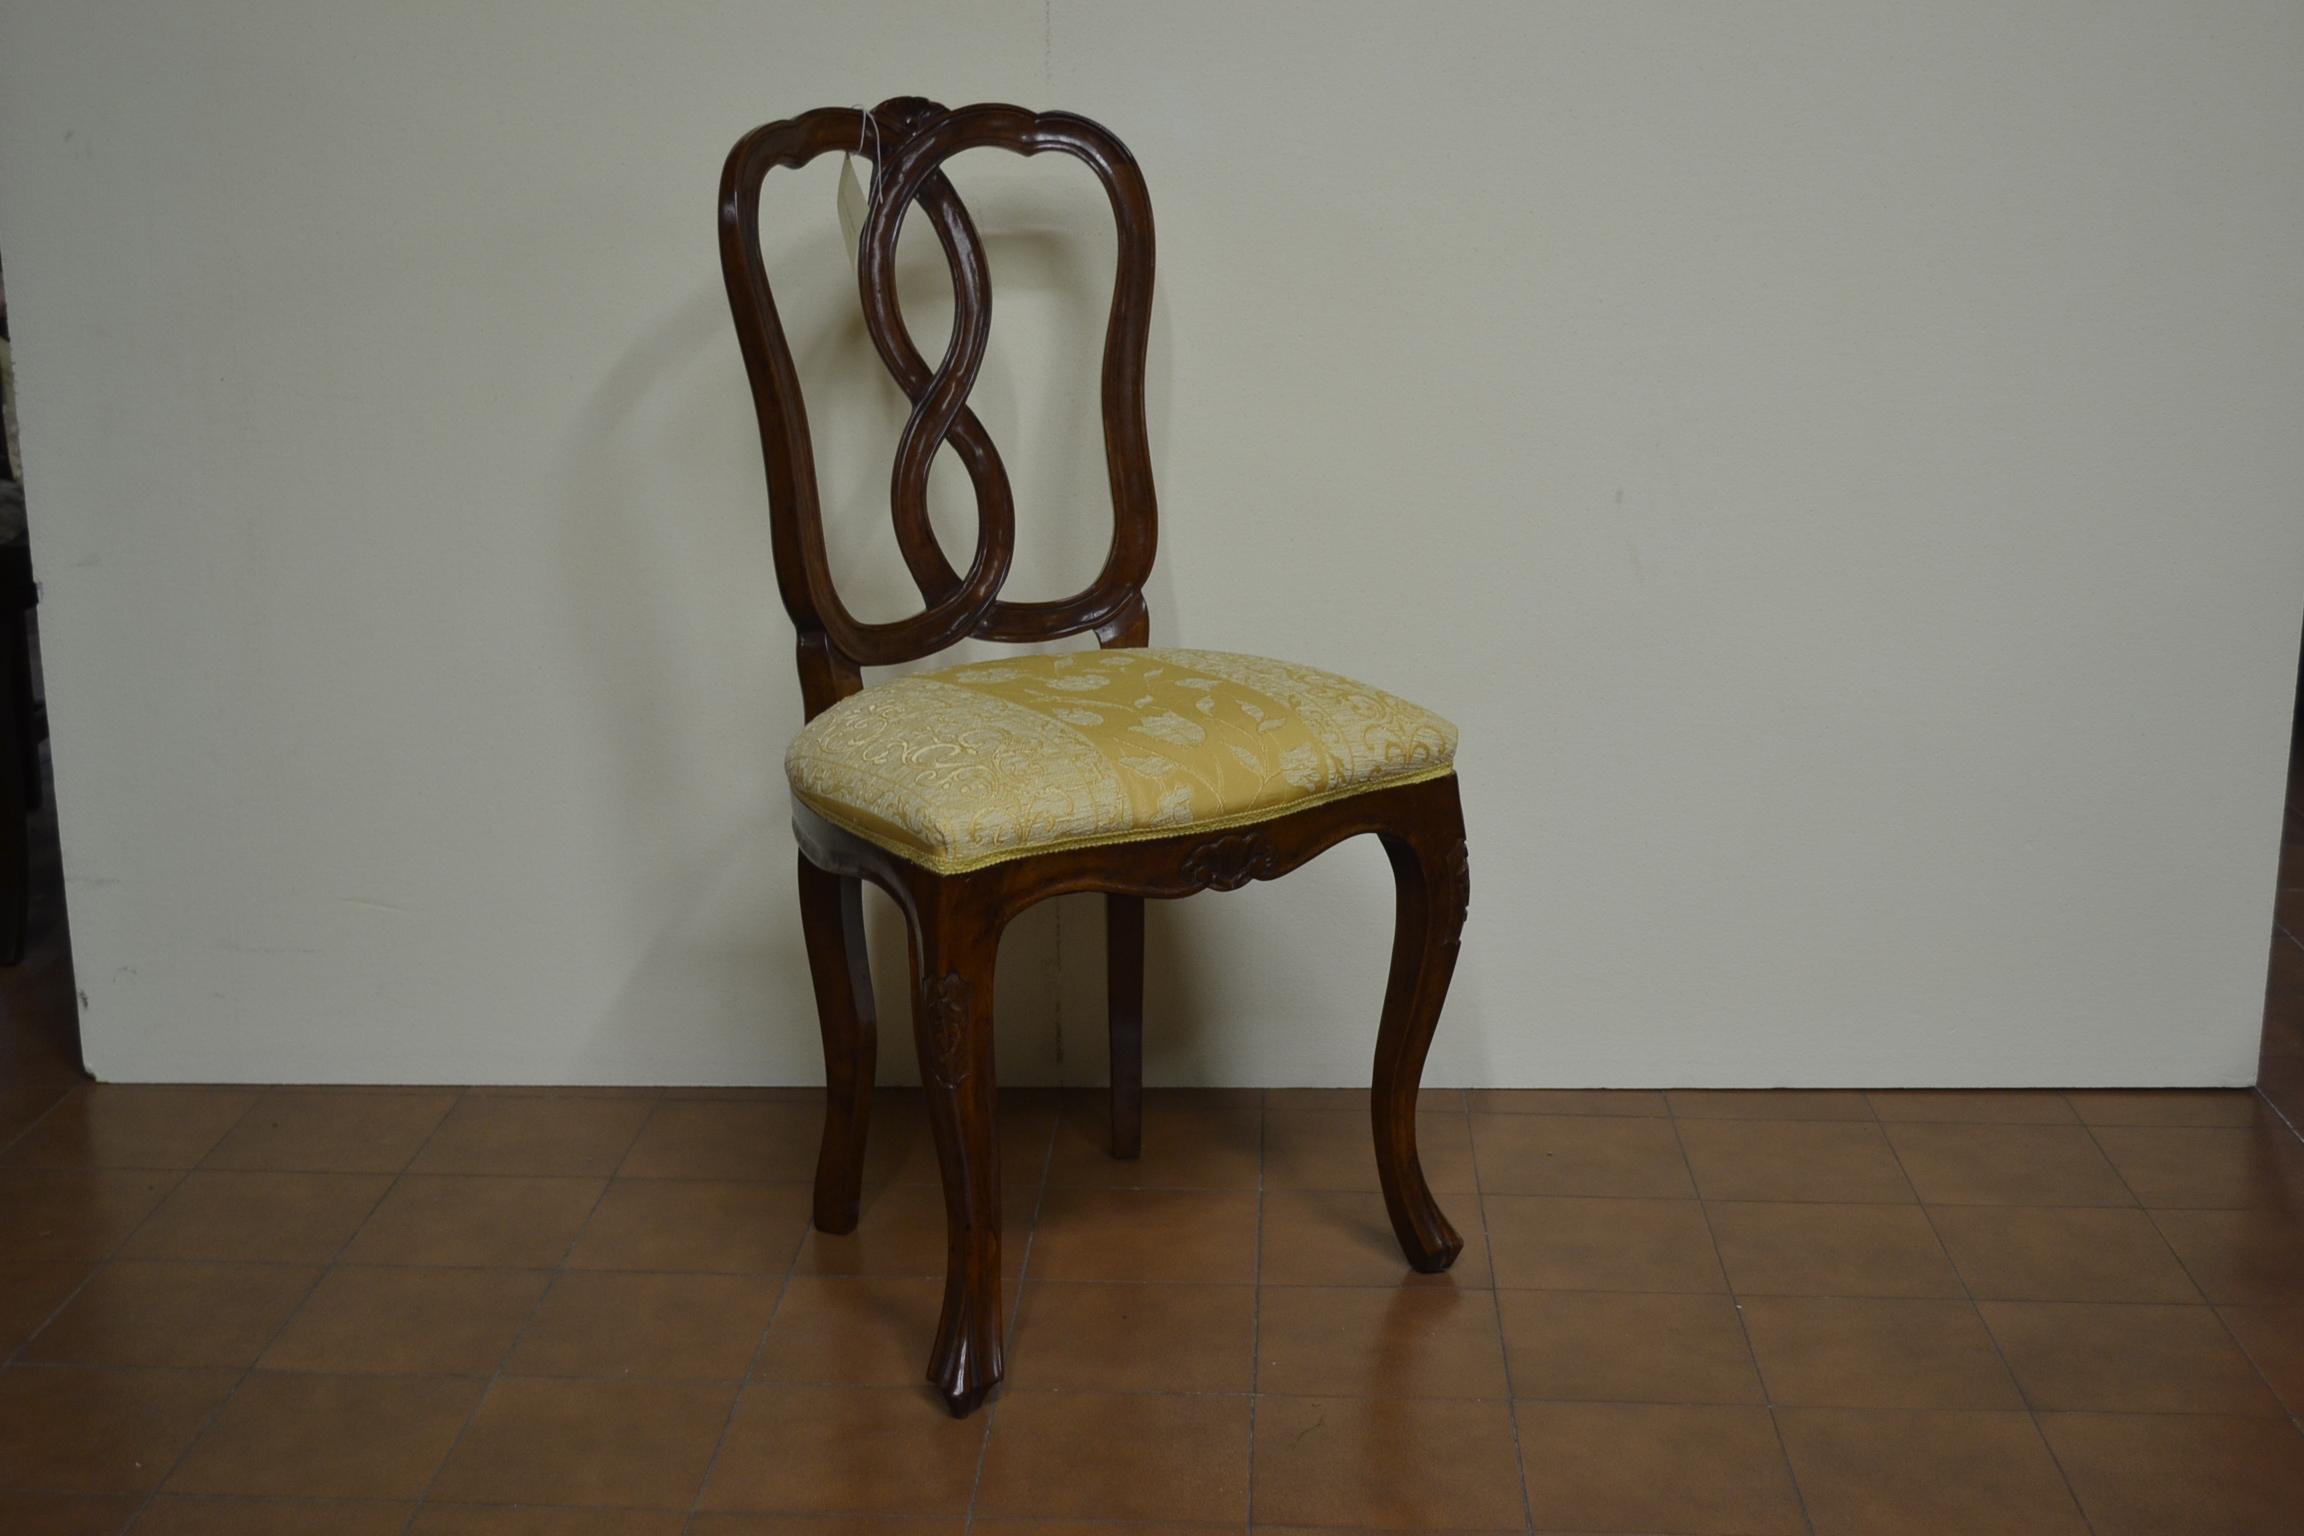 Sedie Stile Windsor : Sedia stile 700 con otto sed 03 livio bernardi mobili mobili d